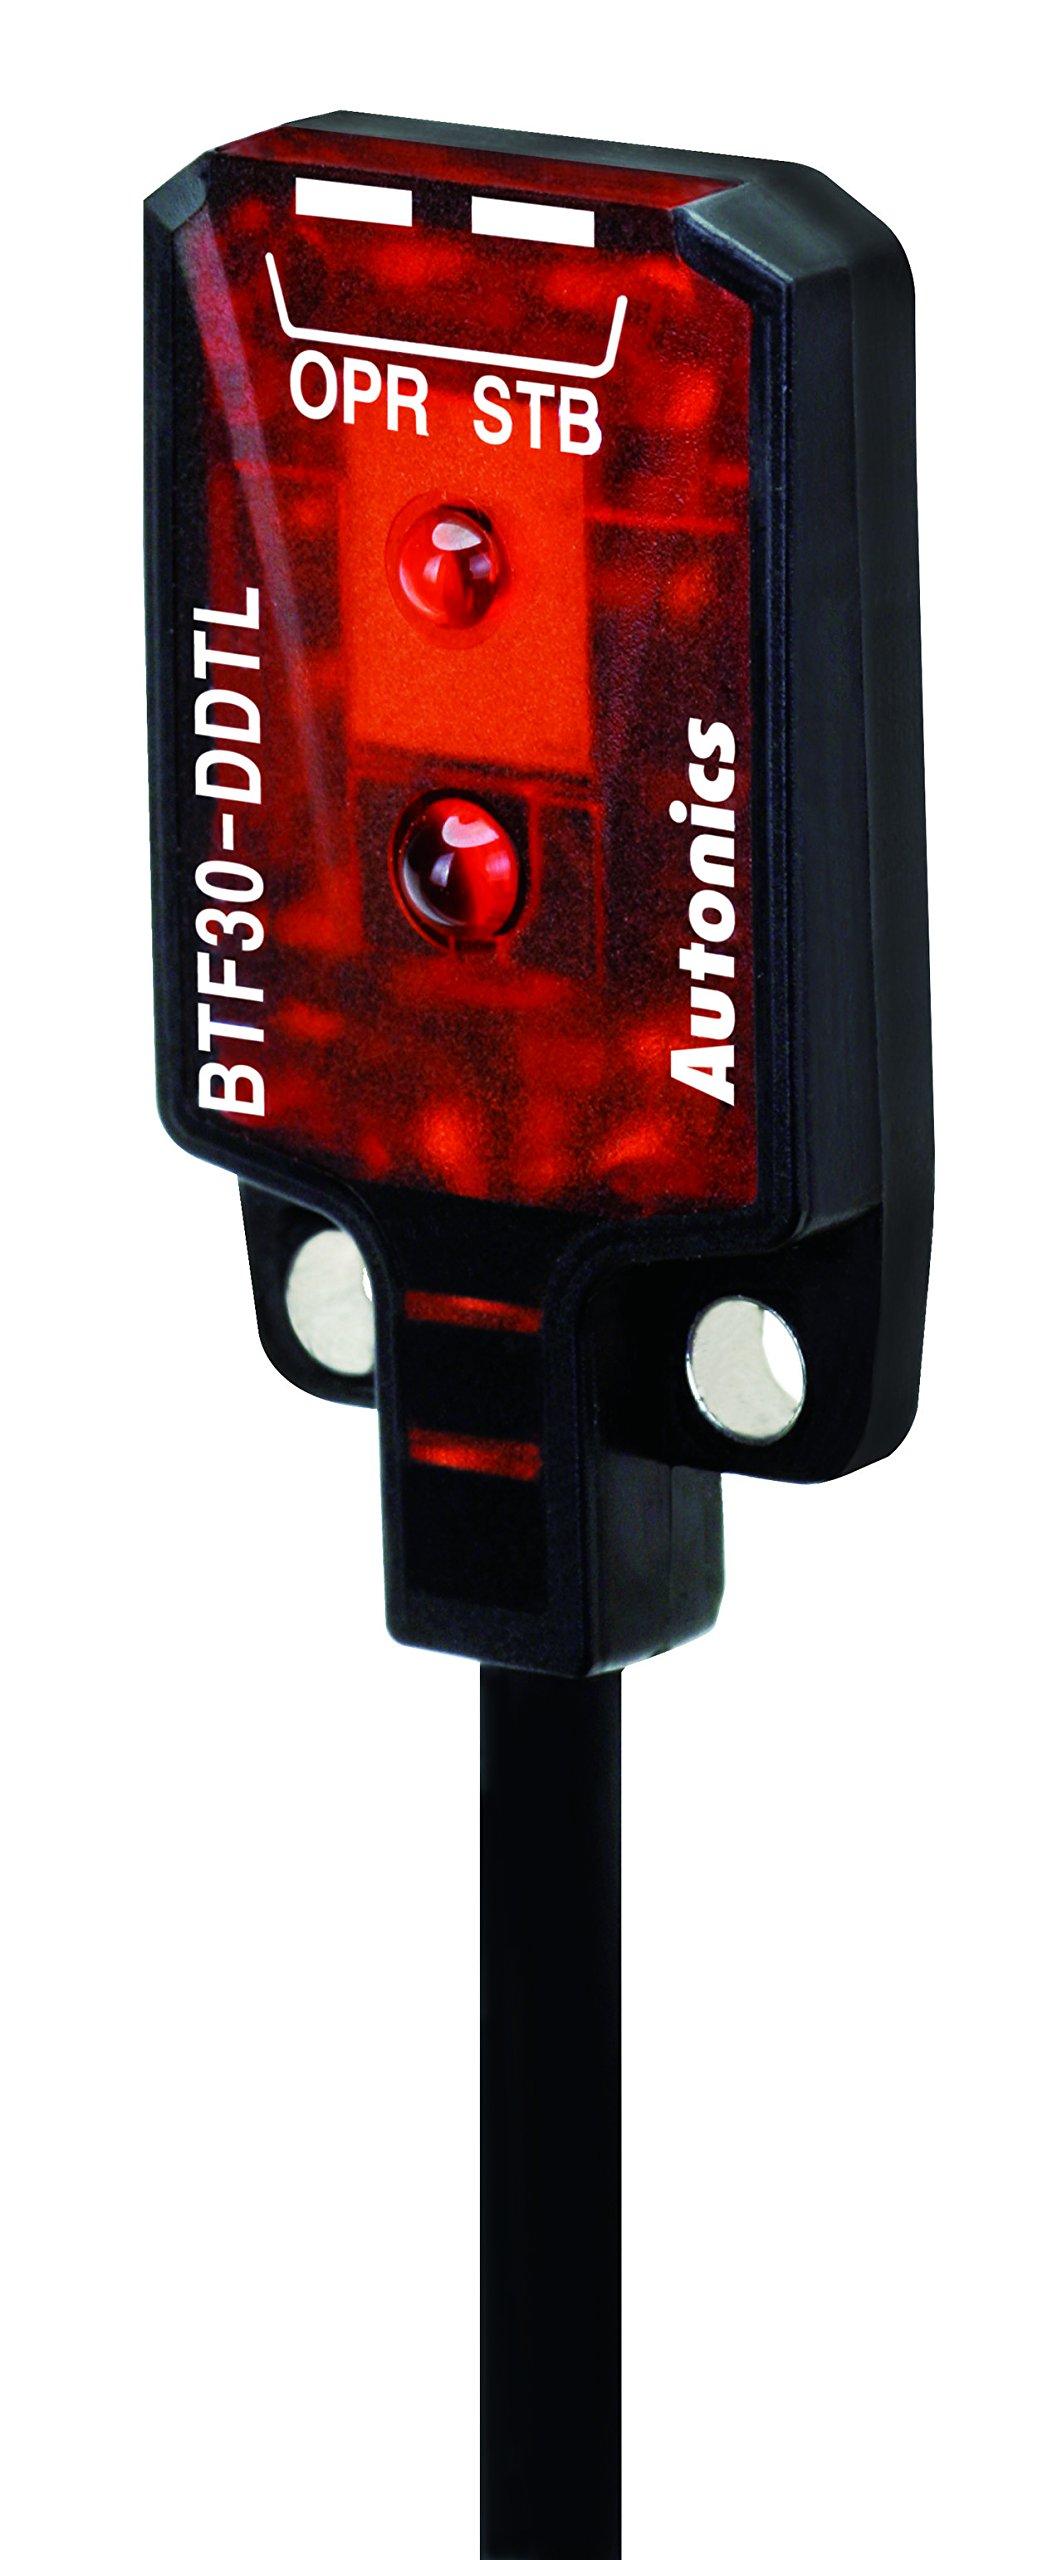 AUTONICS BTF30-DDTL-P Sensor, Photo, Diffuse, 5~30mm Sensing Distance, Light On, PNP Output, 12-24VDC